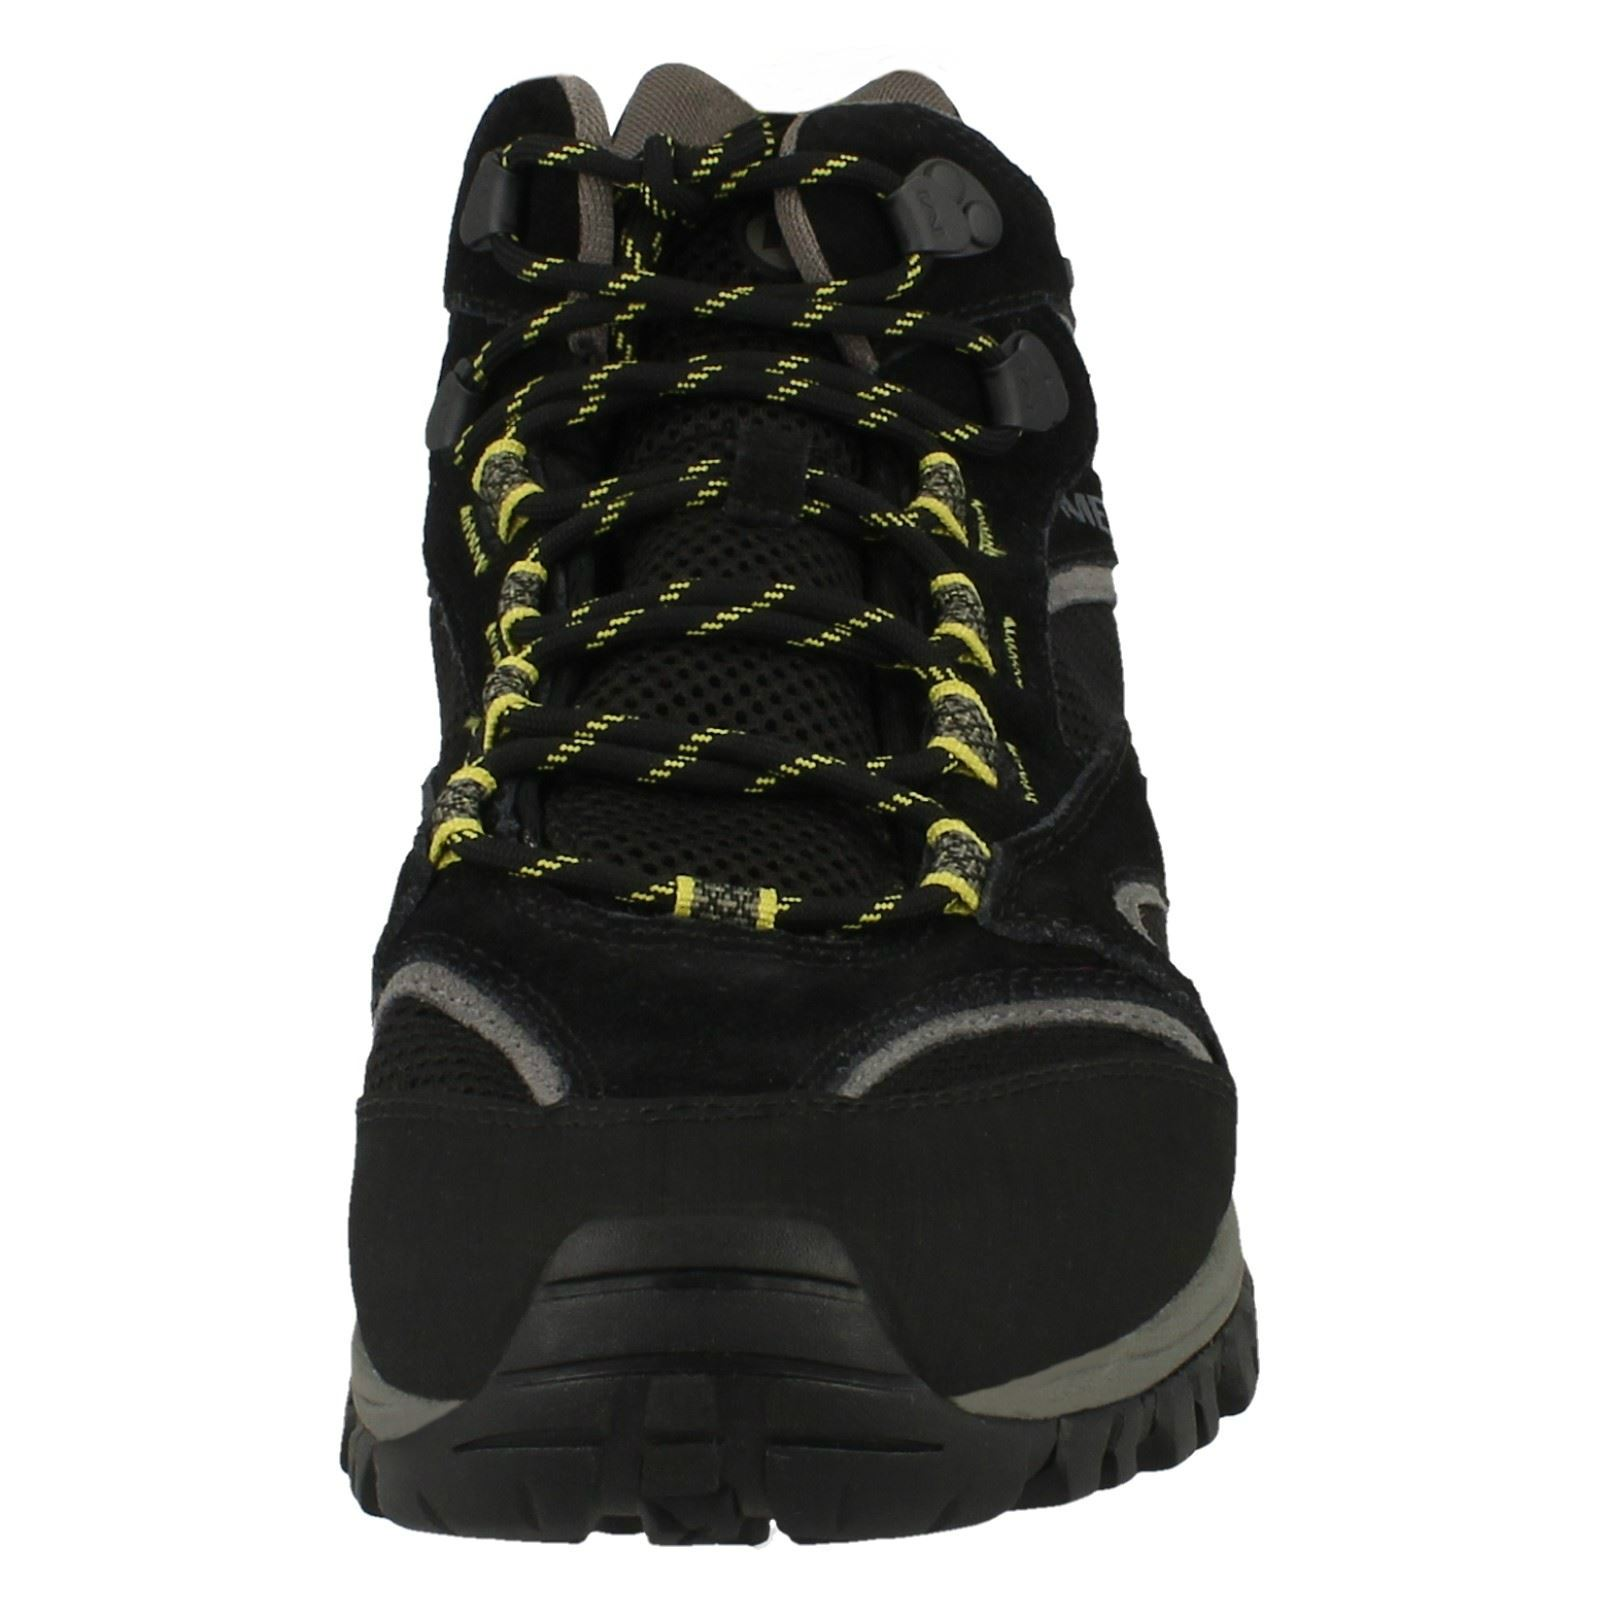 thumbnail 3 - Mens-Merrell-Waterproof-Walking-Boots-Phoenix-Mid